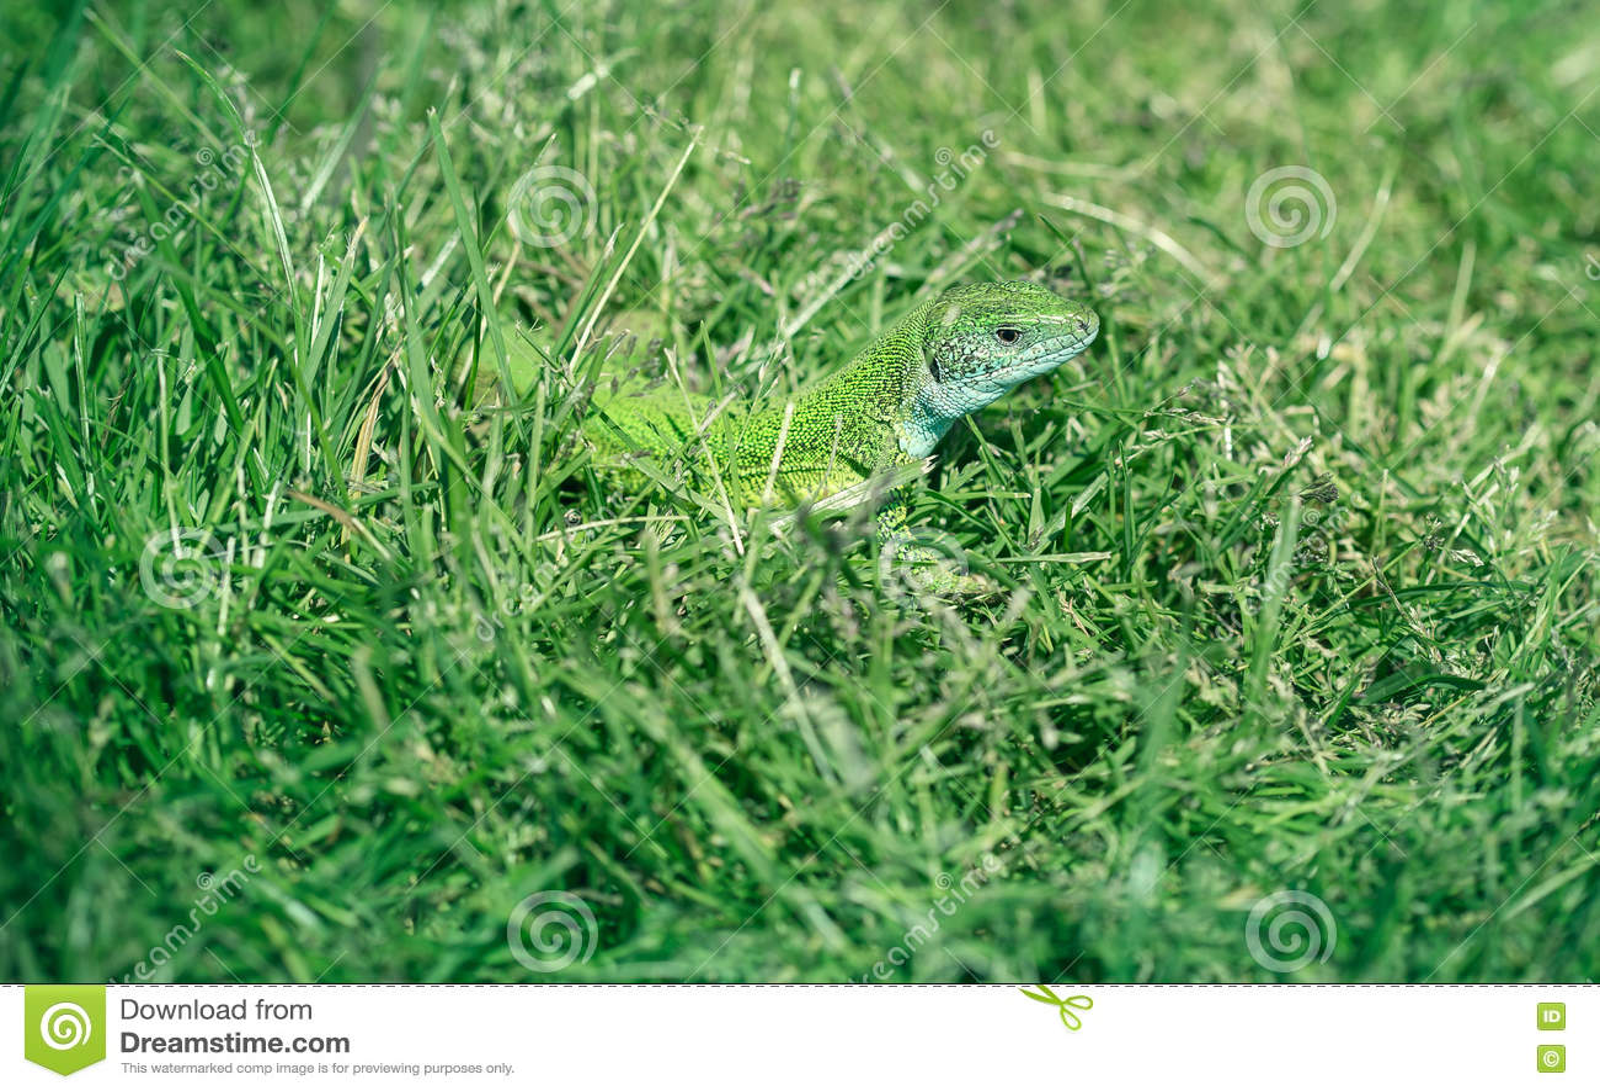 Зеленая ящерица в траве, поглощая жару солнца